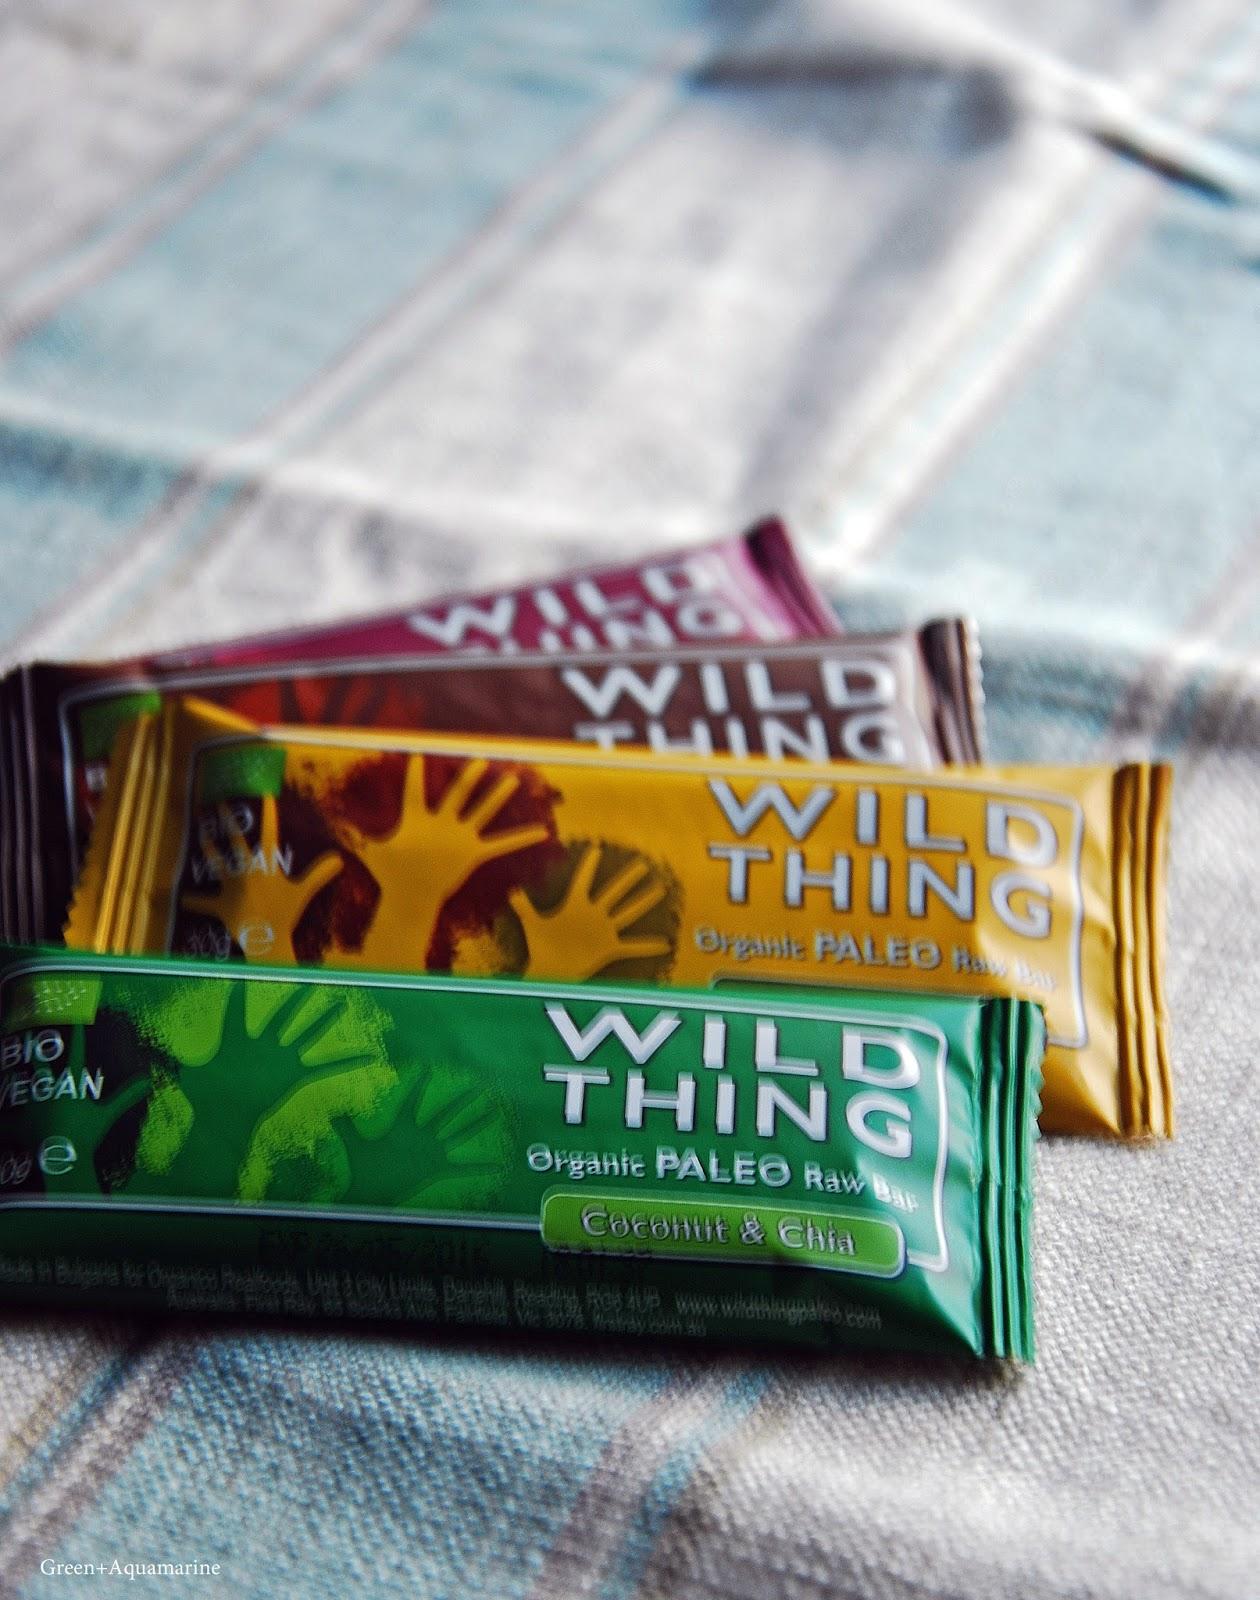 Trying the paleo organic and vegan Wild Thing bars. Via @eleanormayc